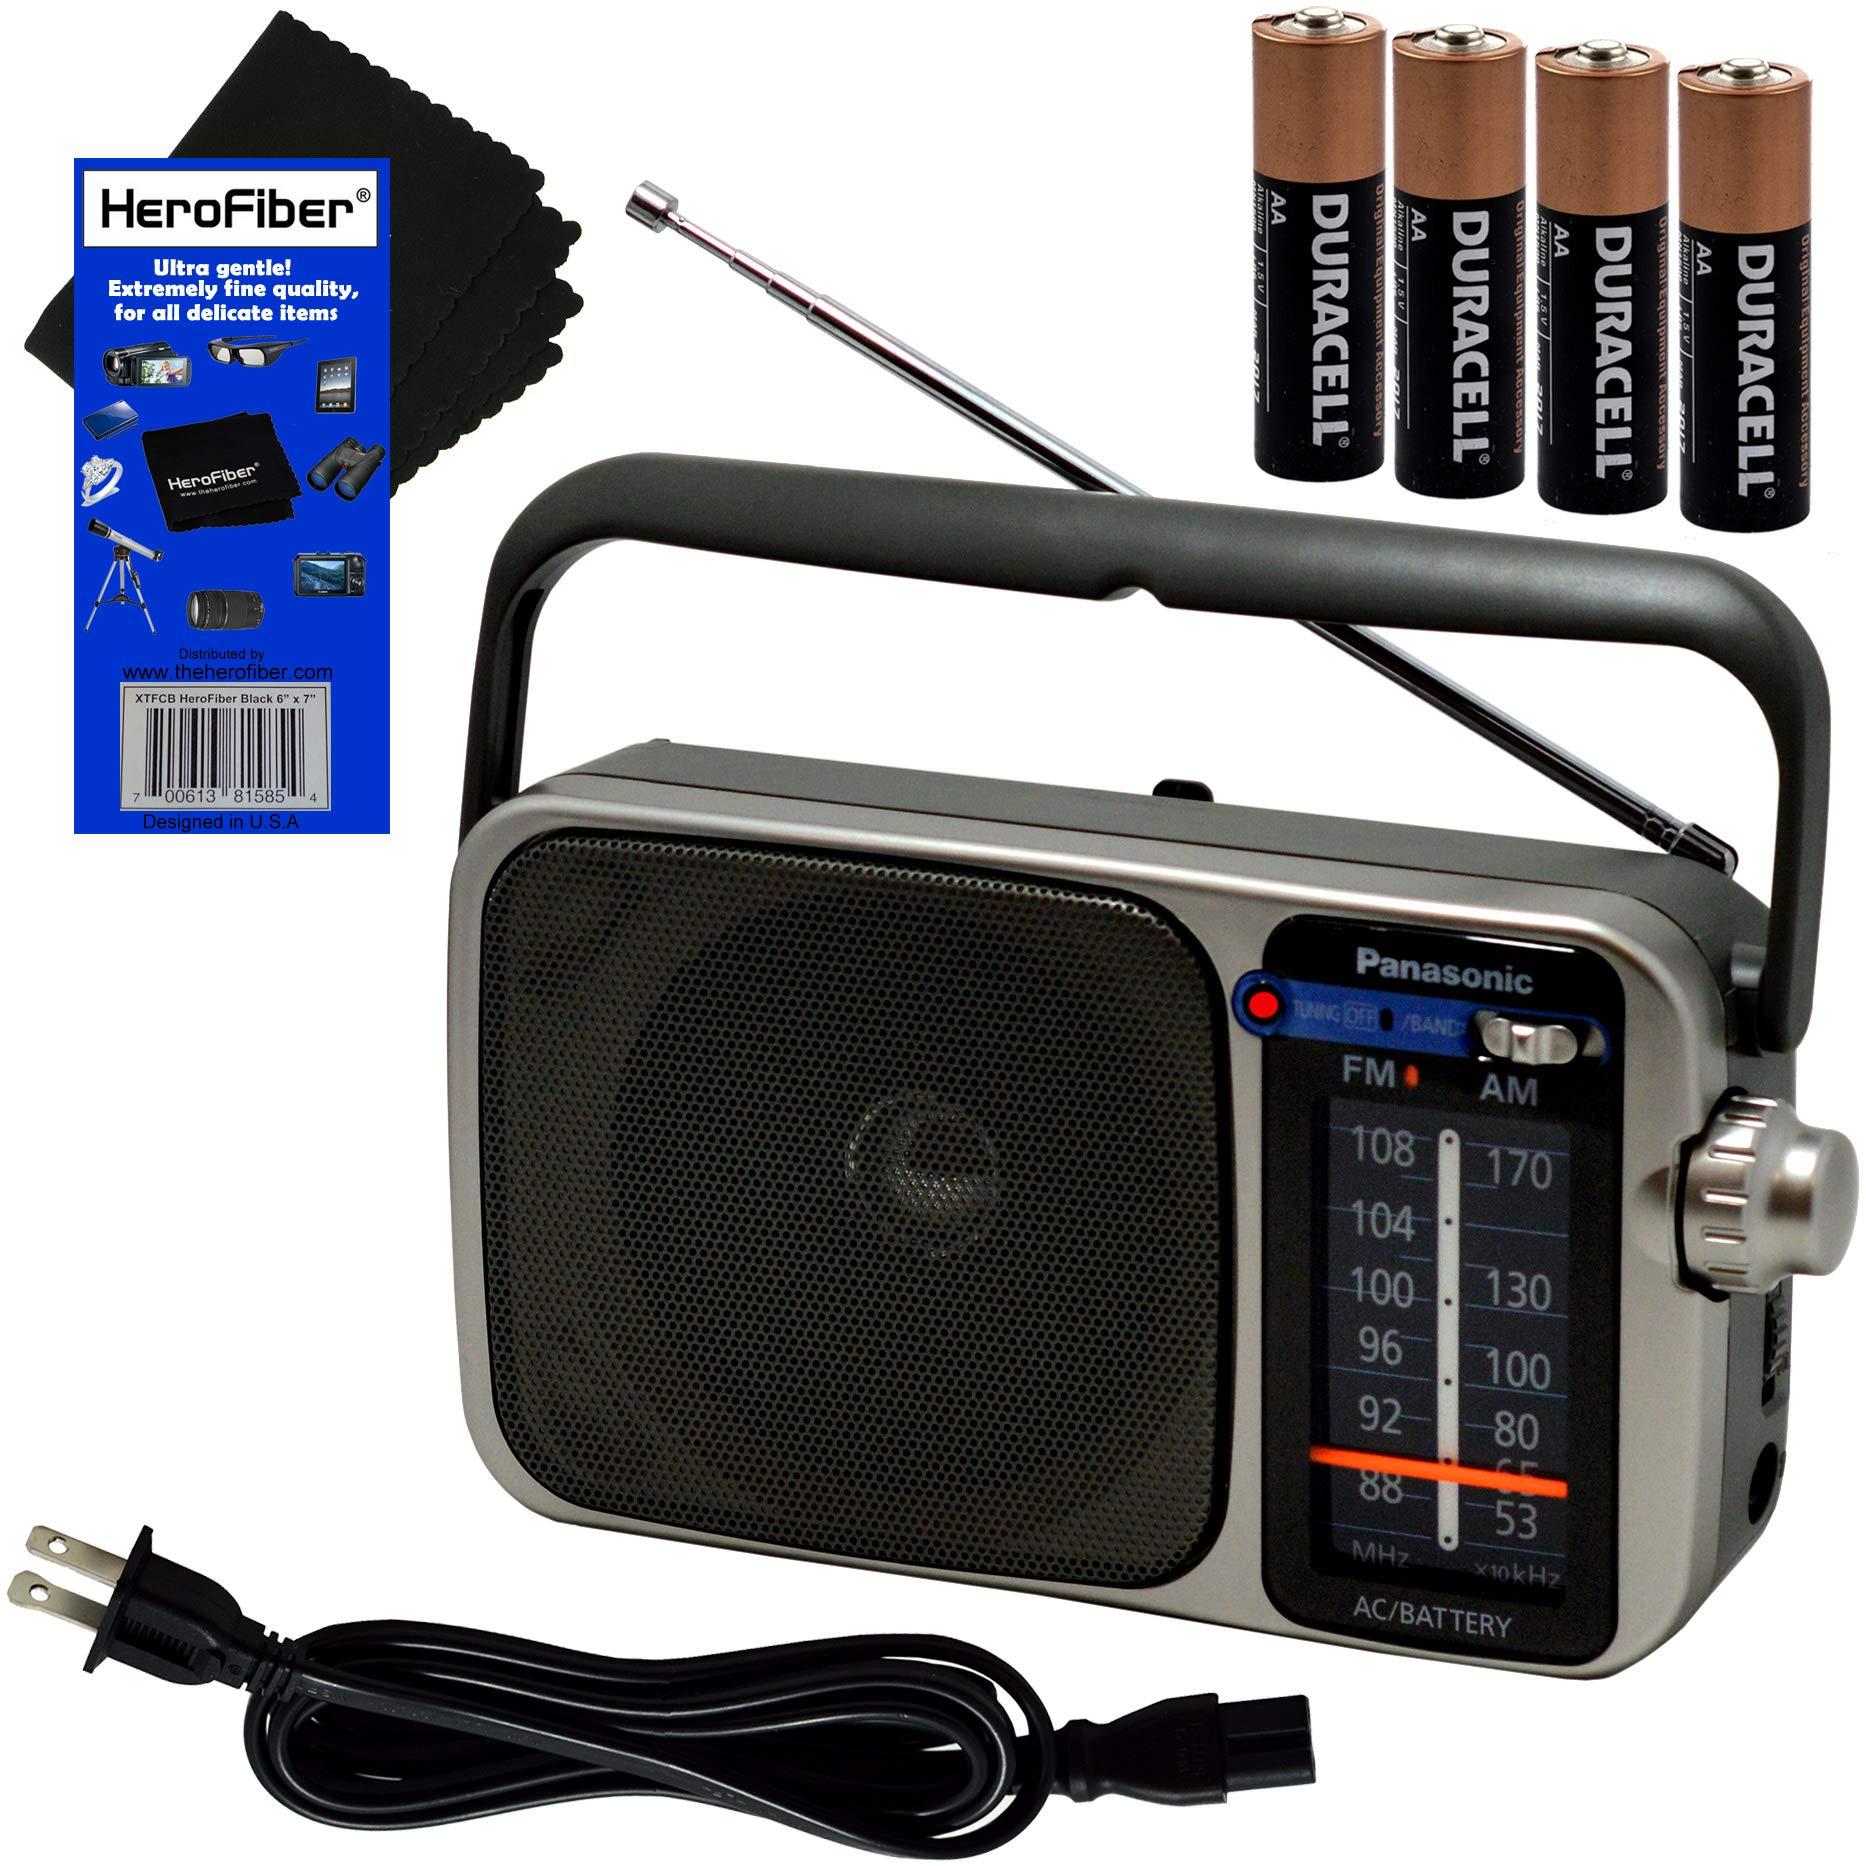 Panasonic Portable Indicator Batteries HeroFiber